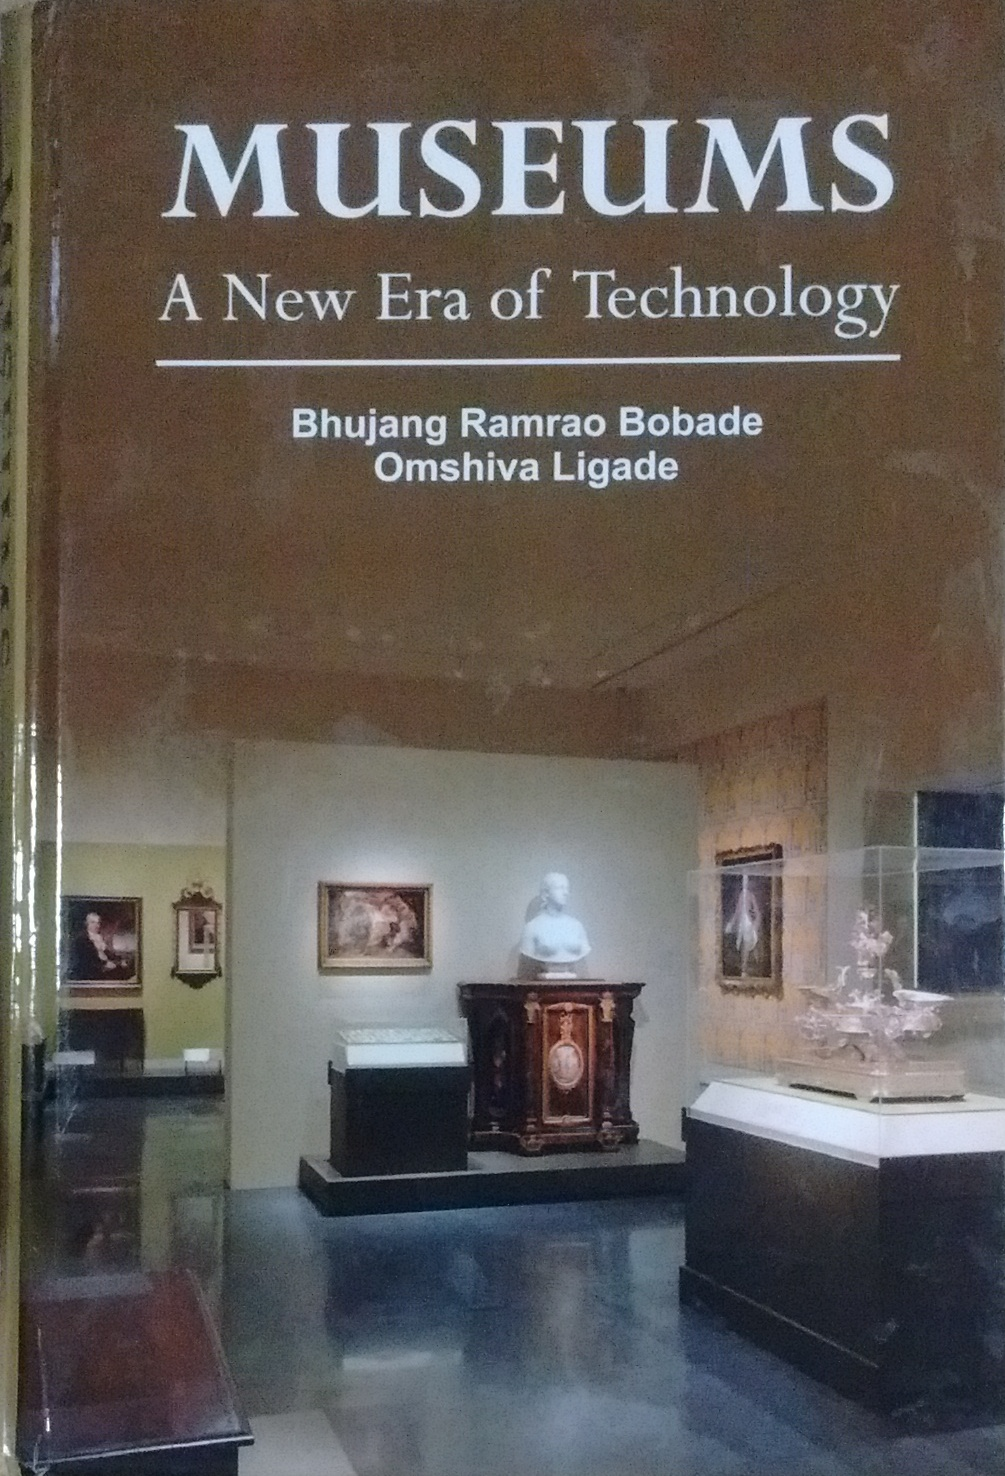 Museums: A New Era of Technology